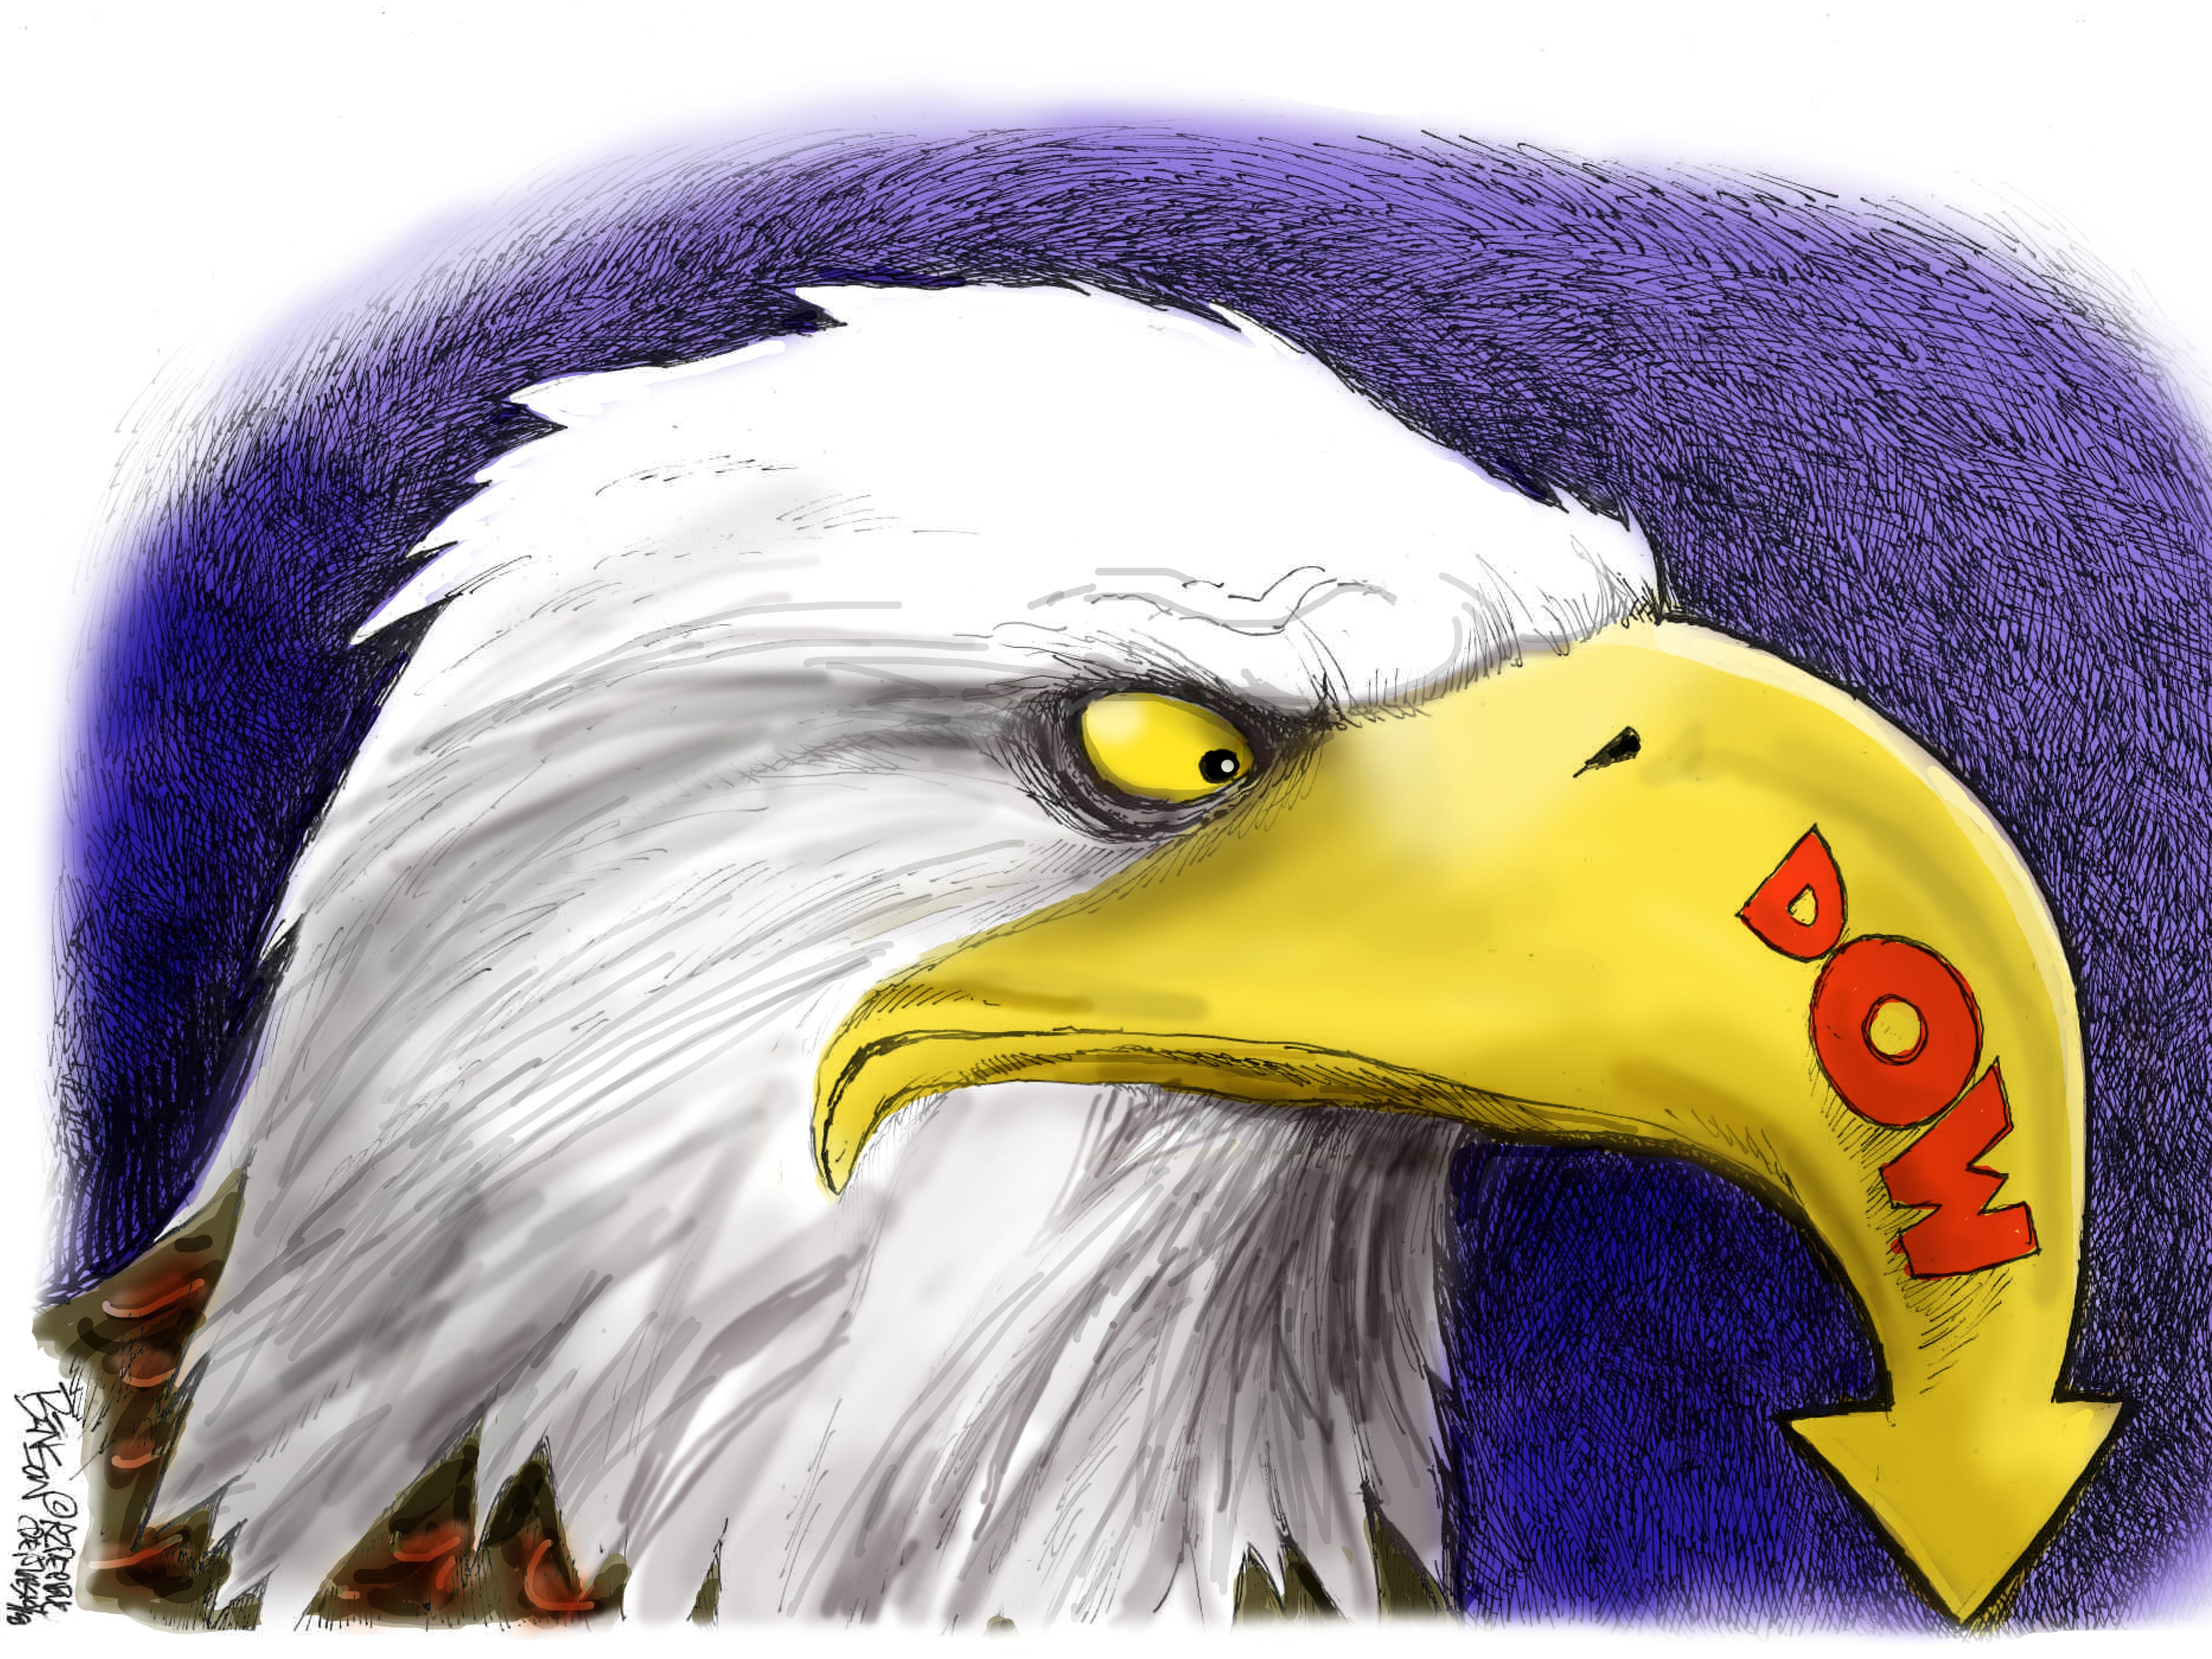 Cartoon for Oct. 14, 2018.